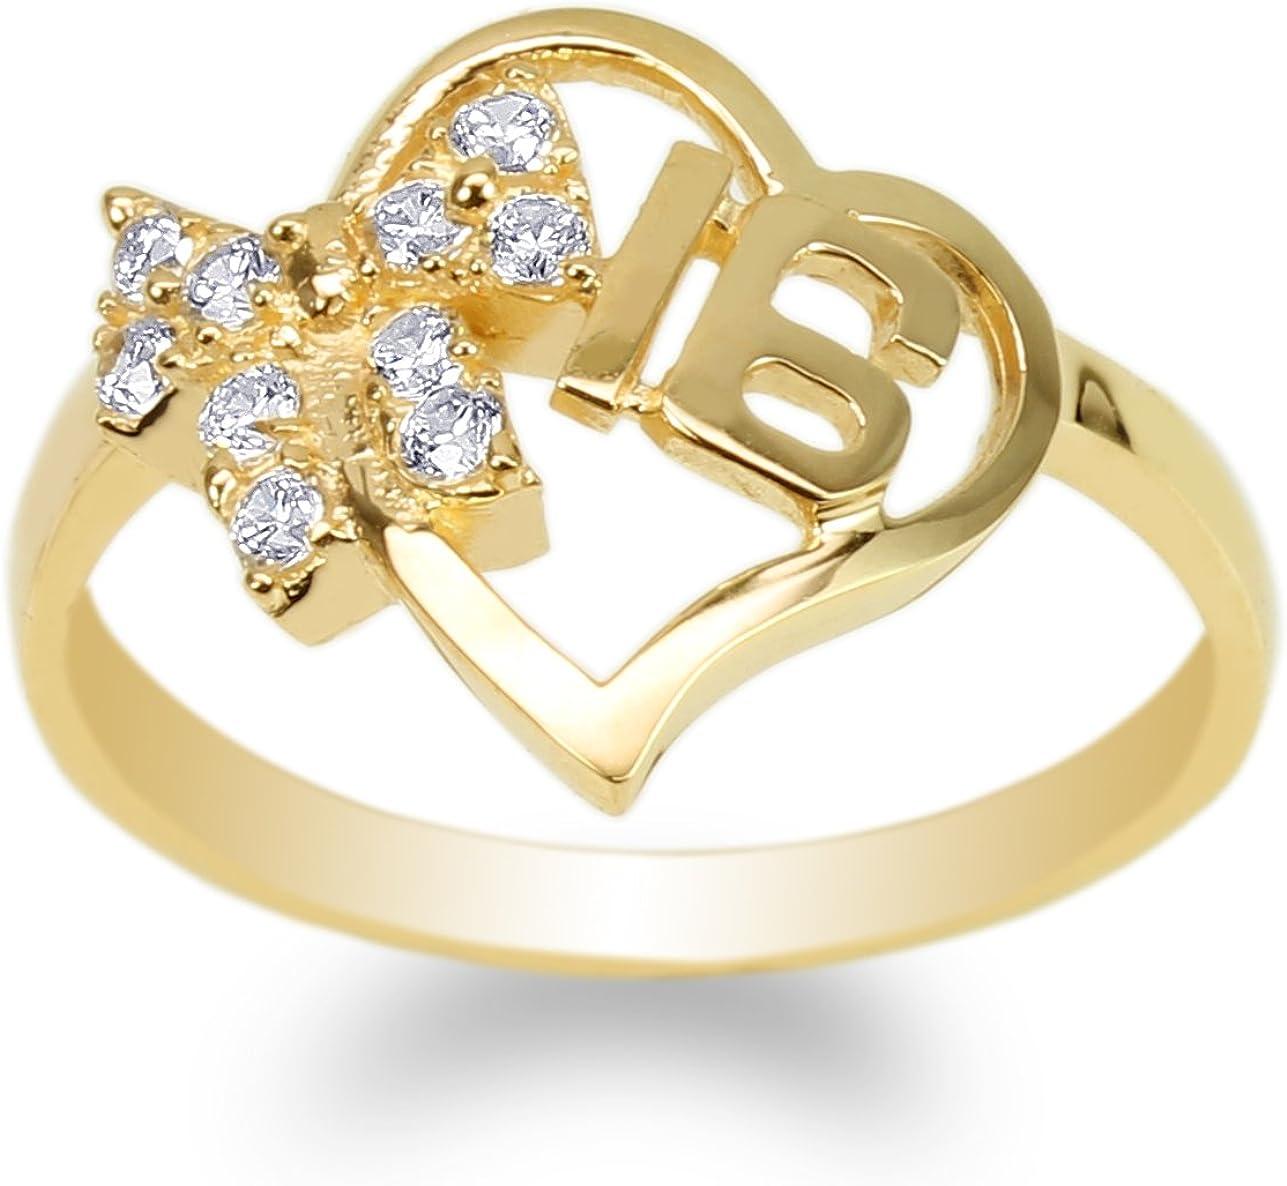 JamesJenny Womens 10K Yellow Gold Ribbon Direct store Shaped 16 Sweet Heart R 35% OFF